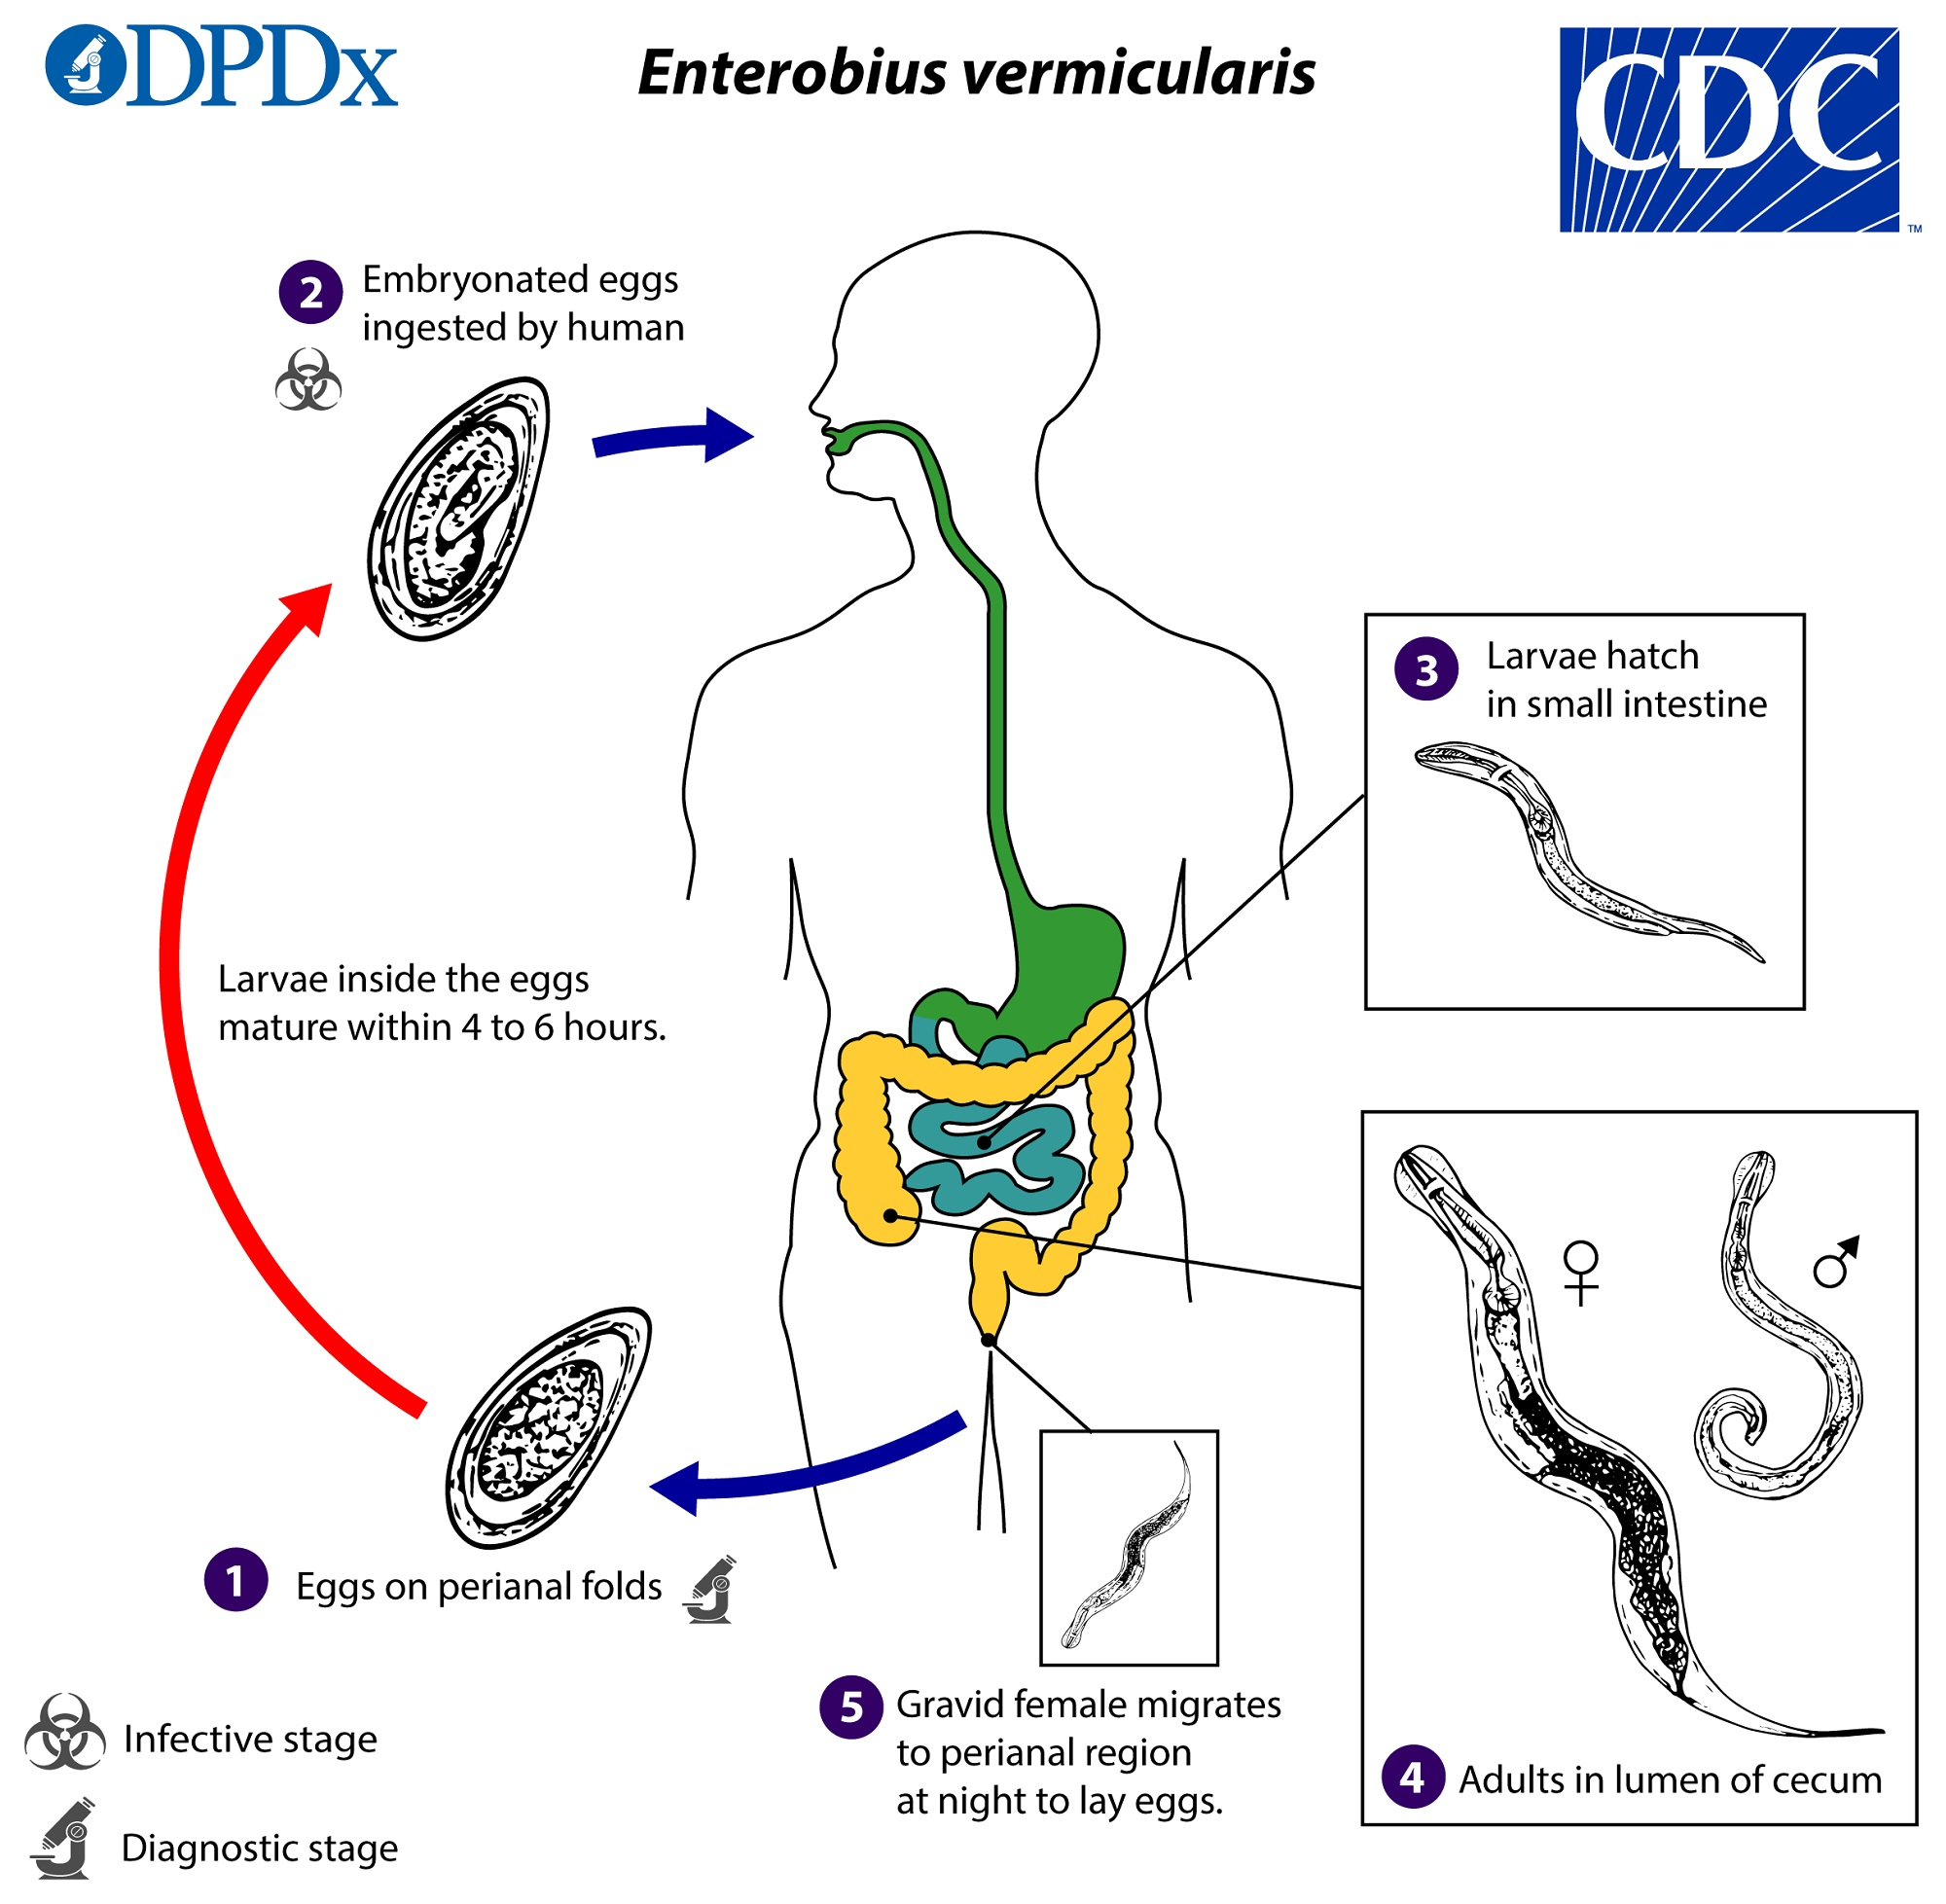 enterobius vermicularis petesejtek